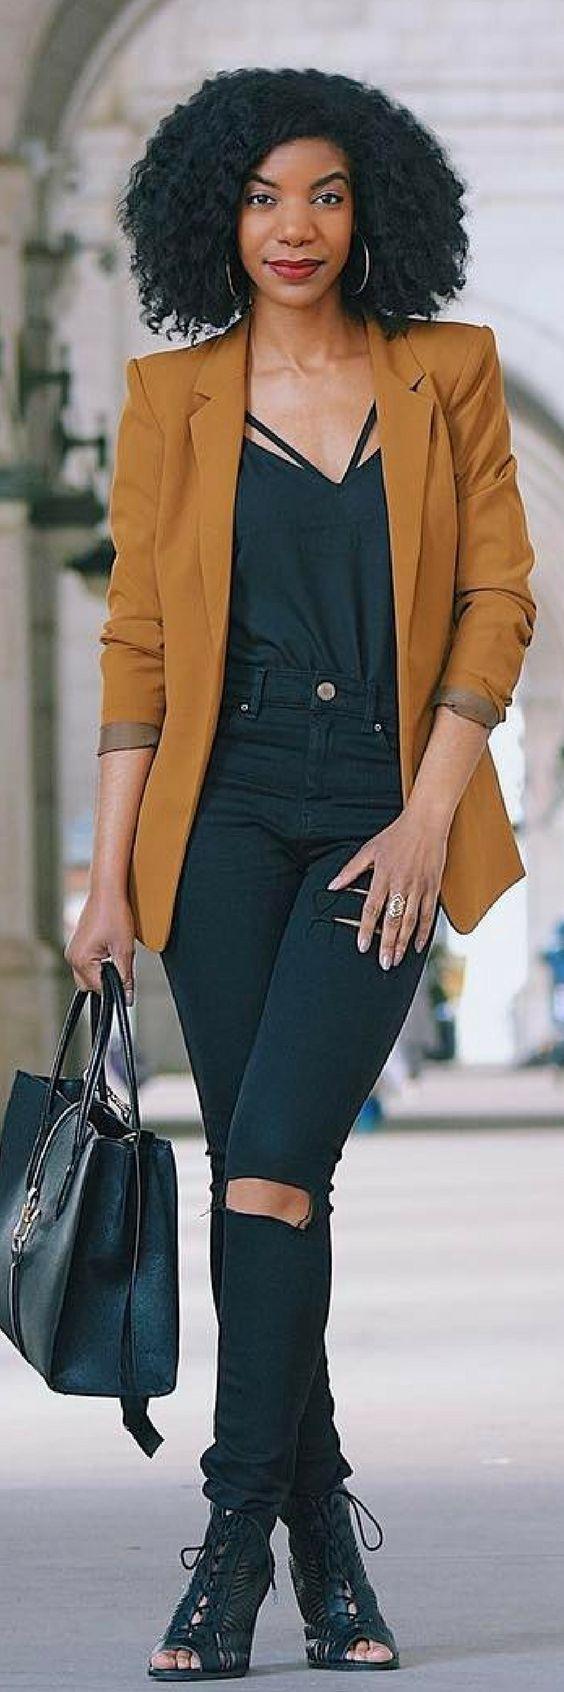 Fashion Look by Kasi Perkins